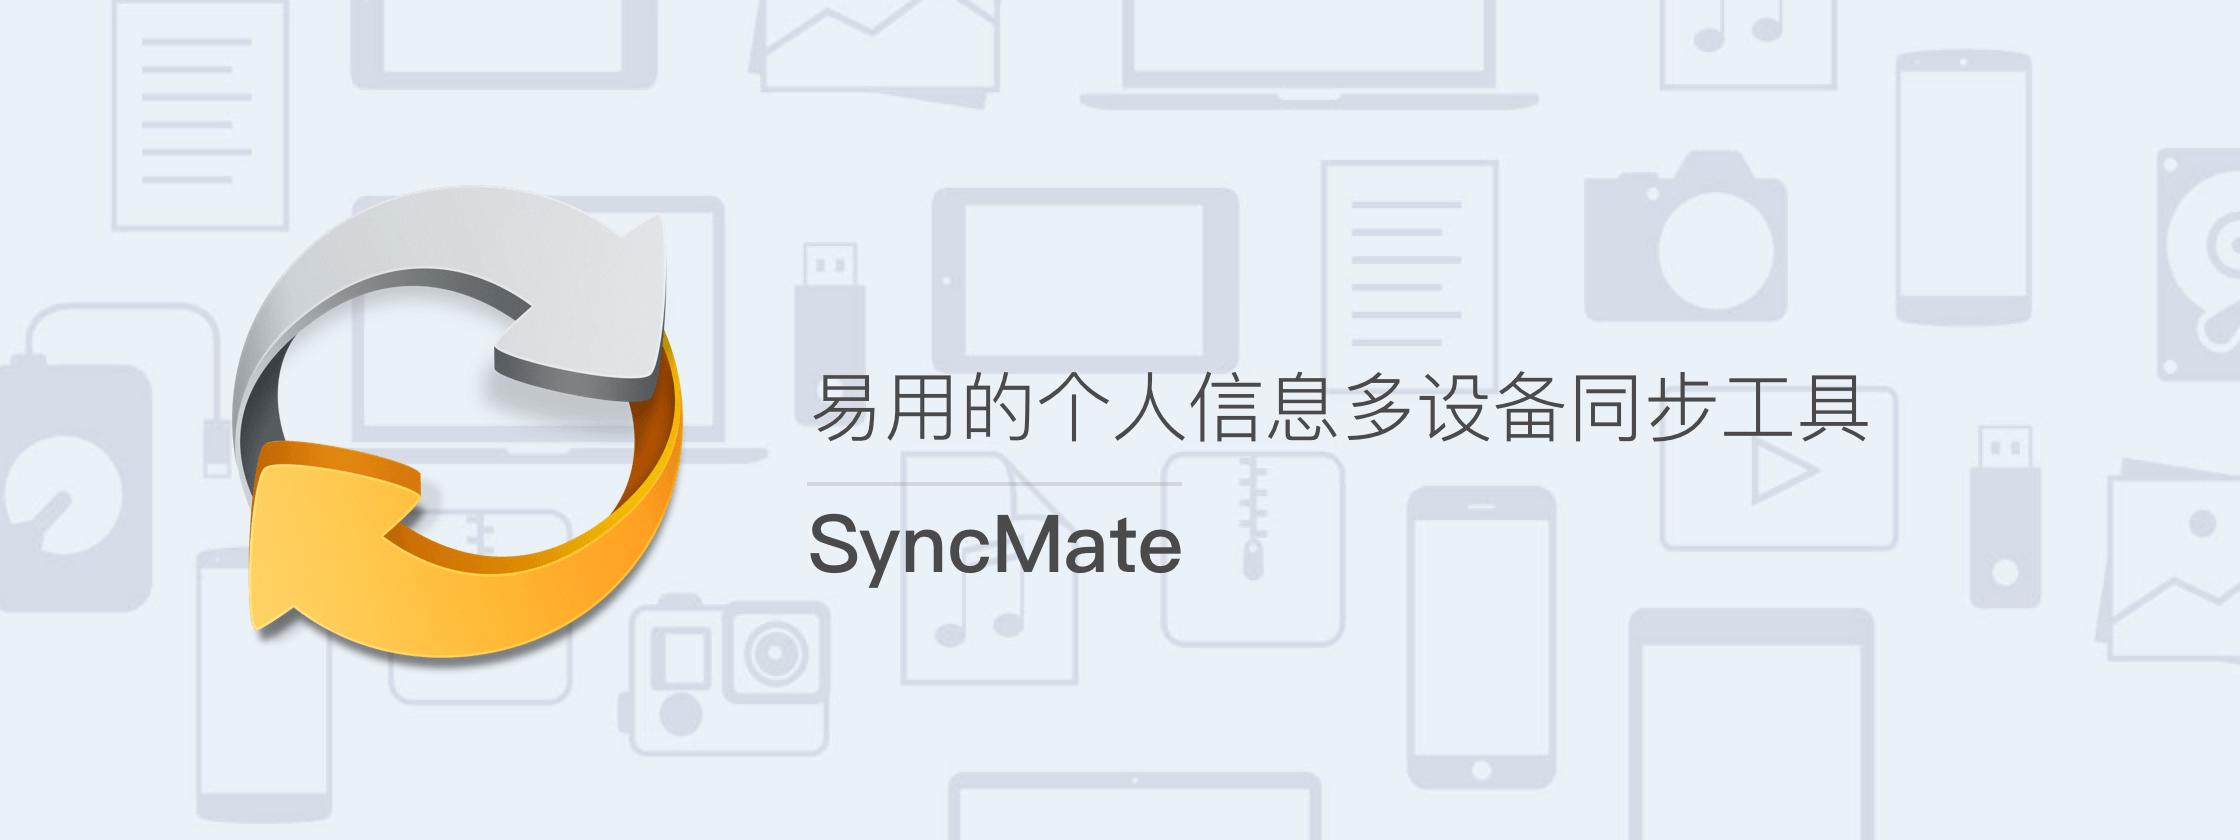 SyncMate – 易用的个人信息多设备同步工具